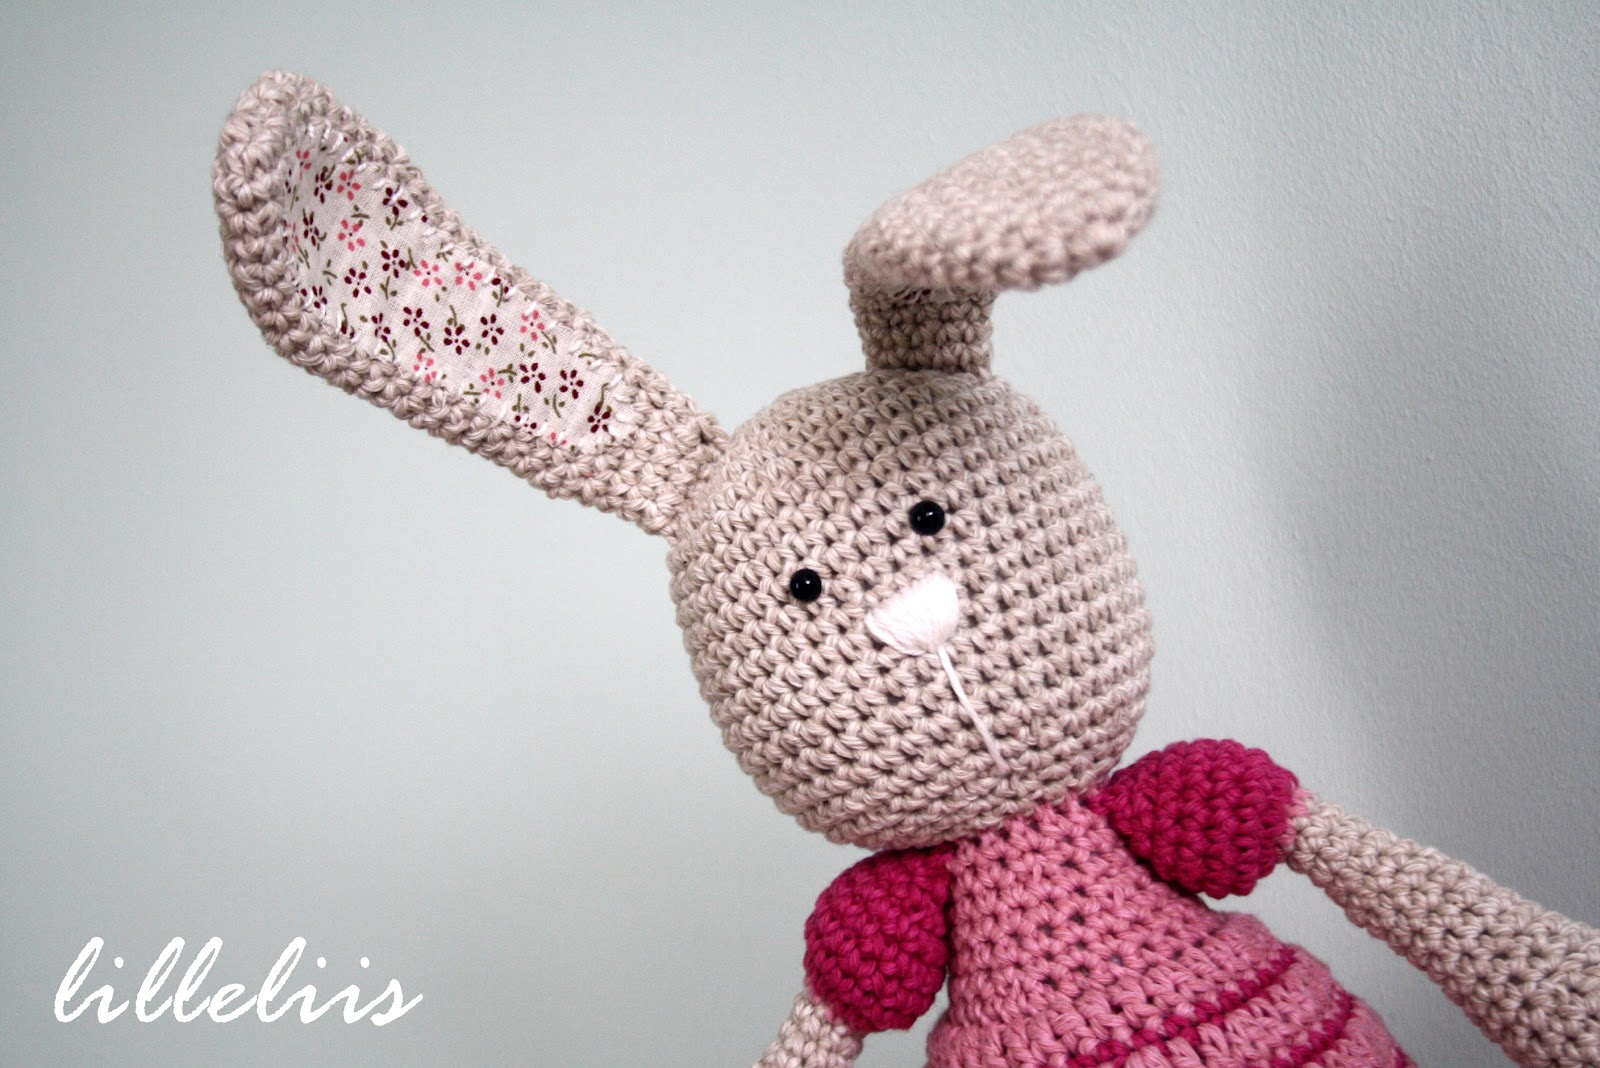 9b0e7dbedb4 lilleliis.blogspot.com: Jänes Sats-püks/ Frilly-pants Bunny